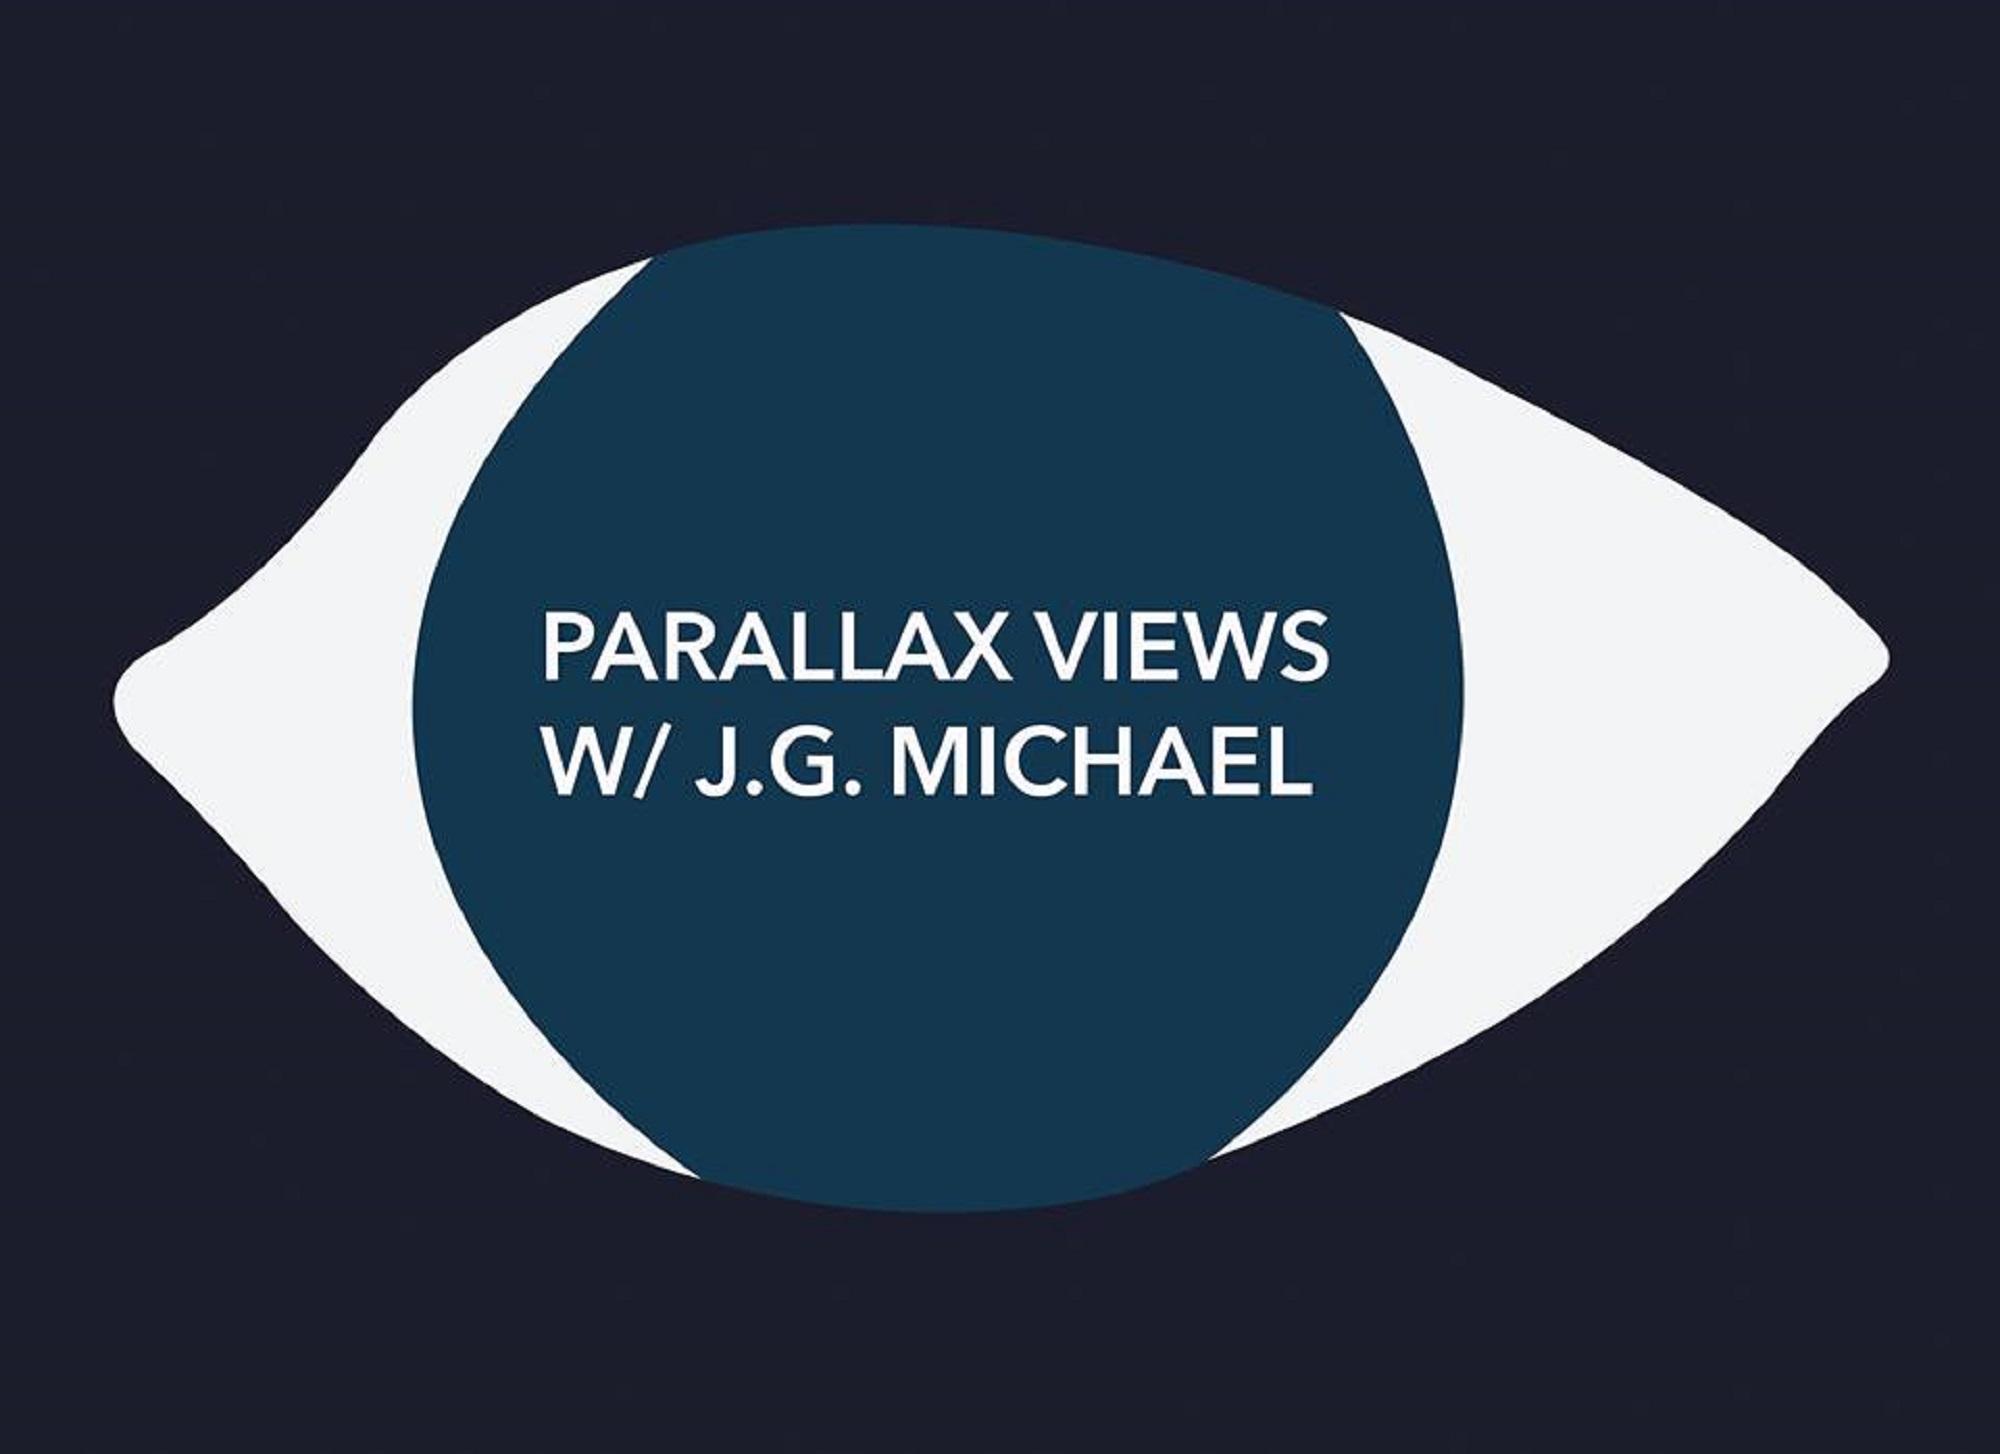 parallaxviewslogo2